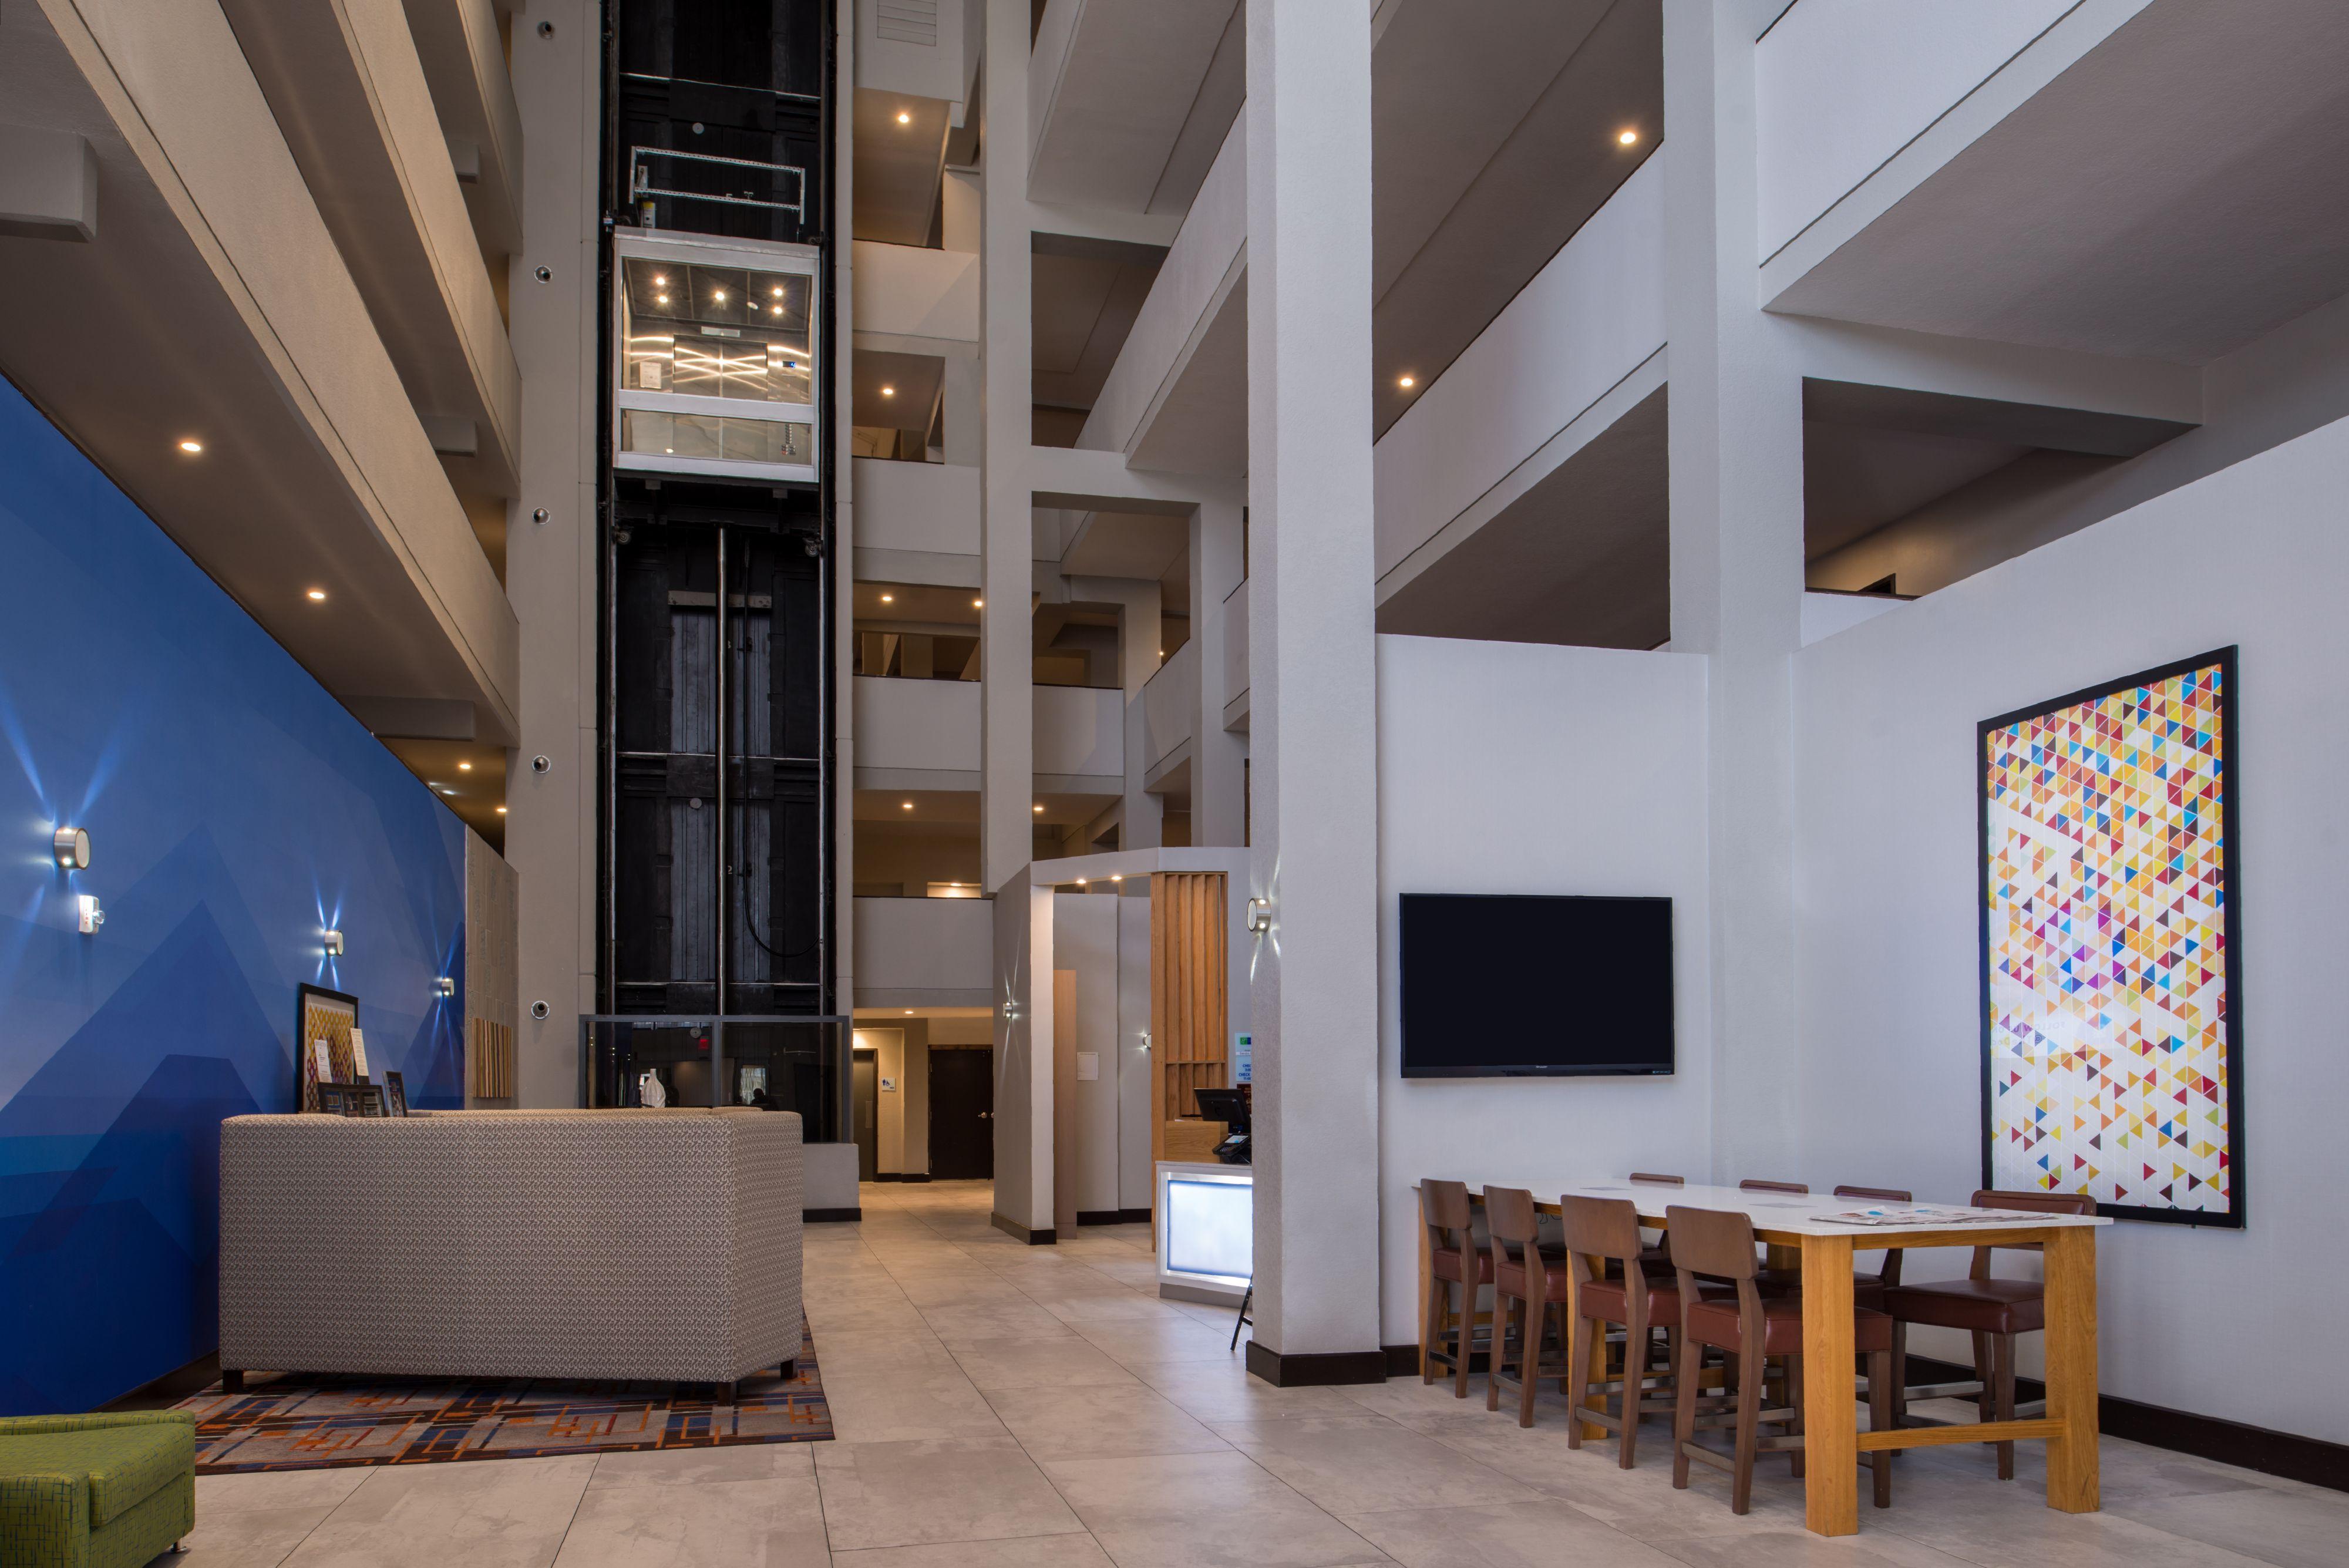 Holiday Inn Express Amp Suites San Antonio Medical Six Flags